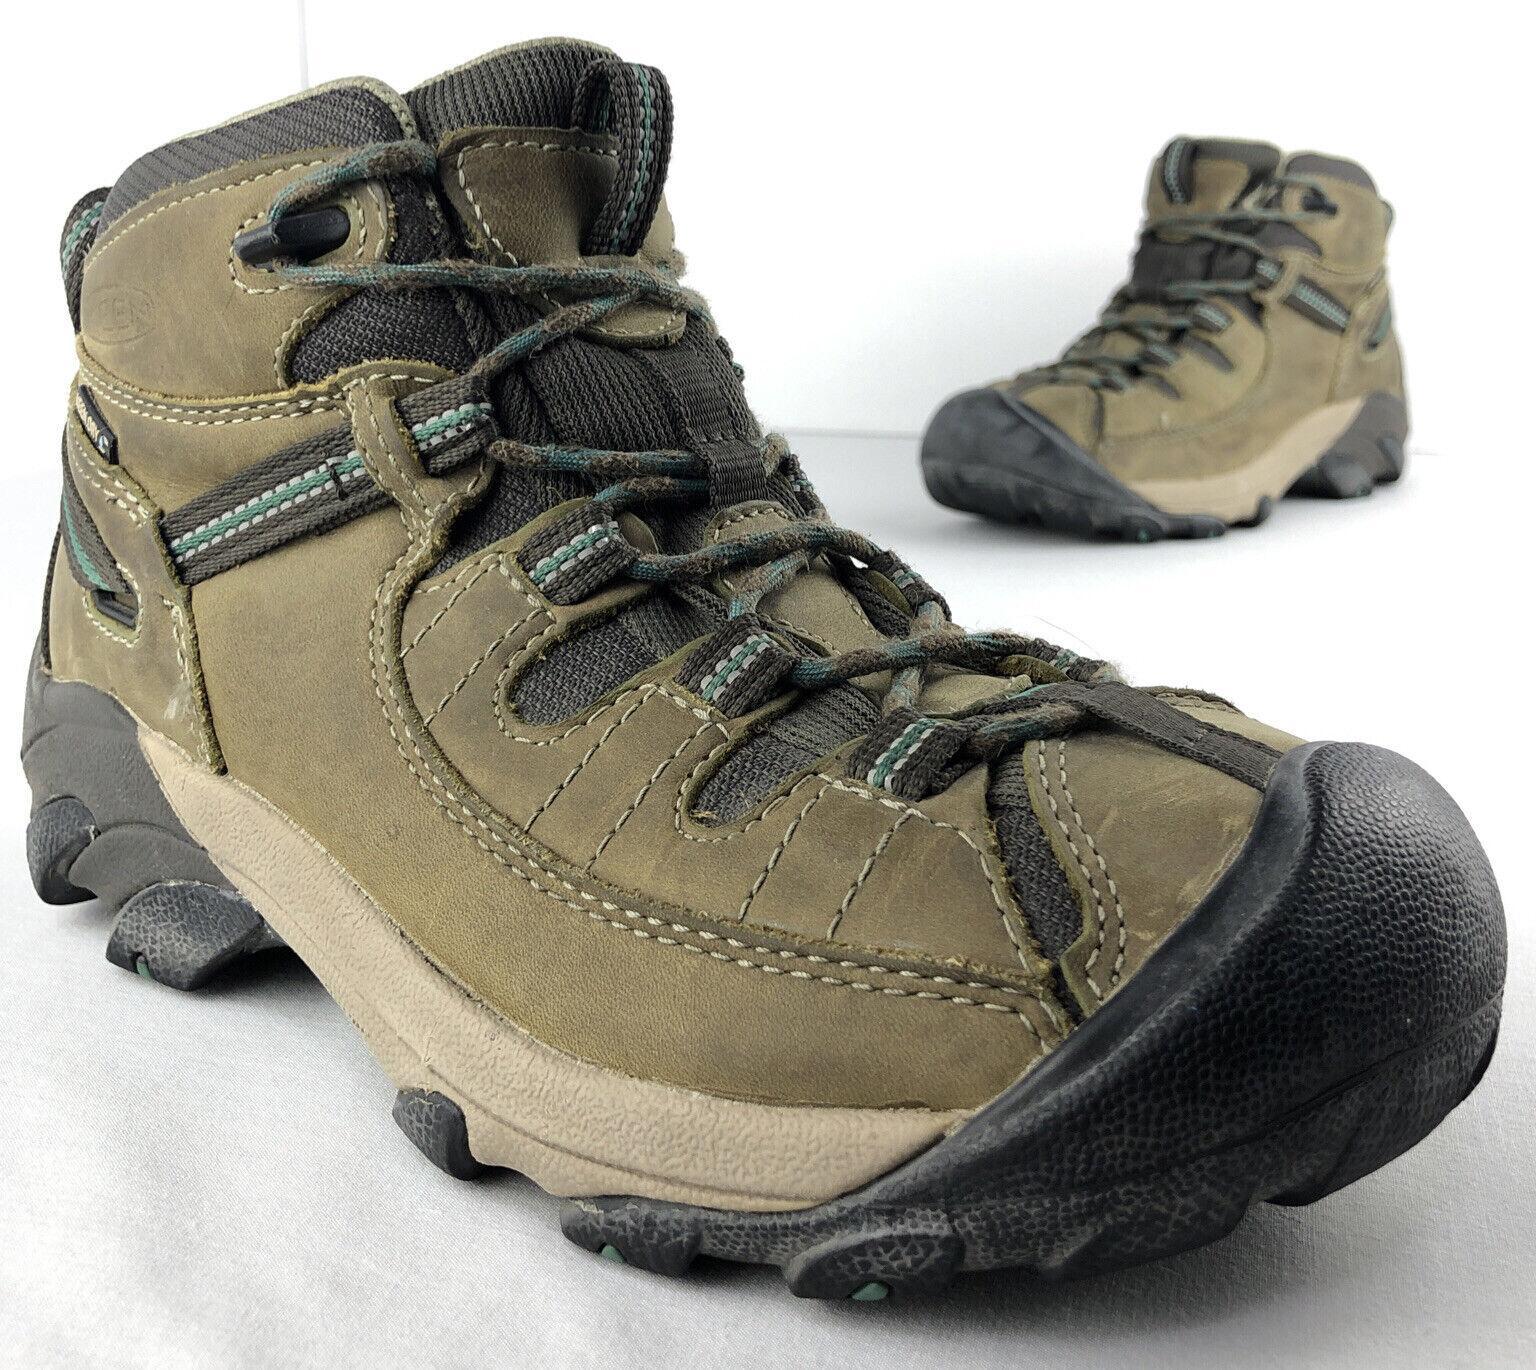 Keen Targhee II Mid Hiking Brown Leather Boots Womens 7 EUR 37.5 Lace Waterproof